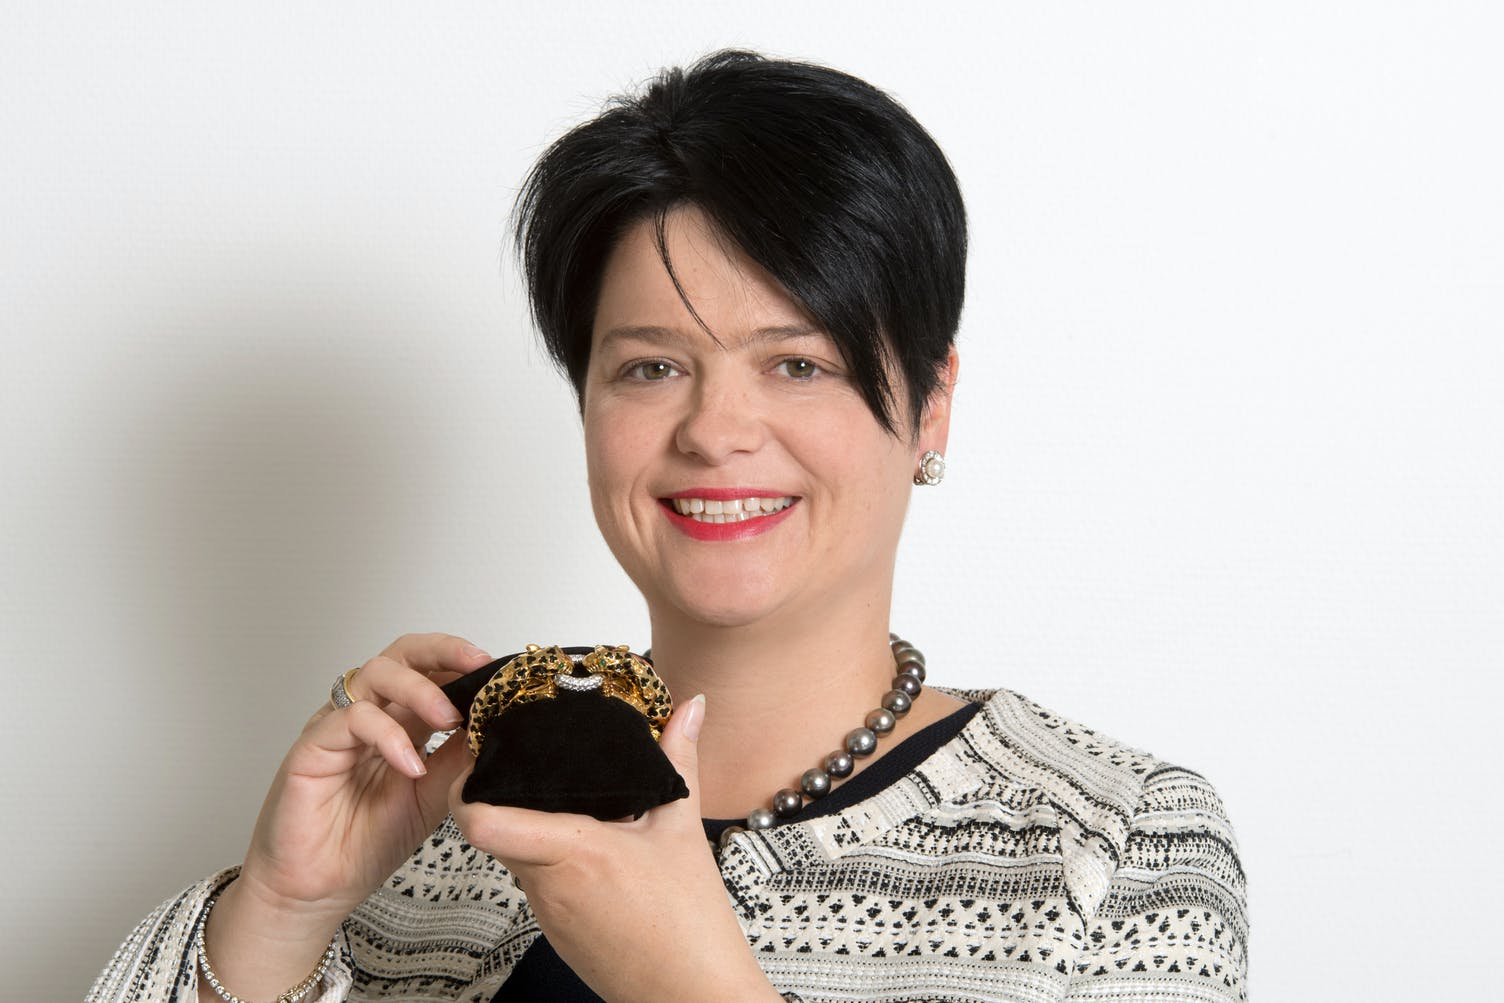 Marianne Rapp